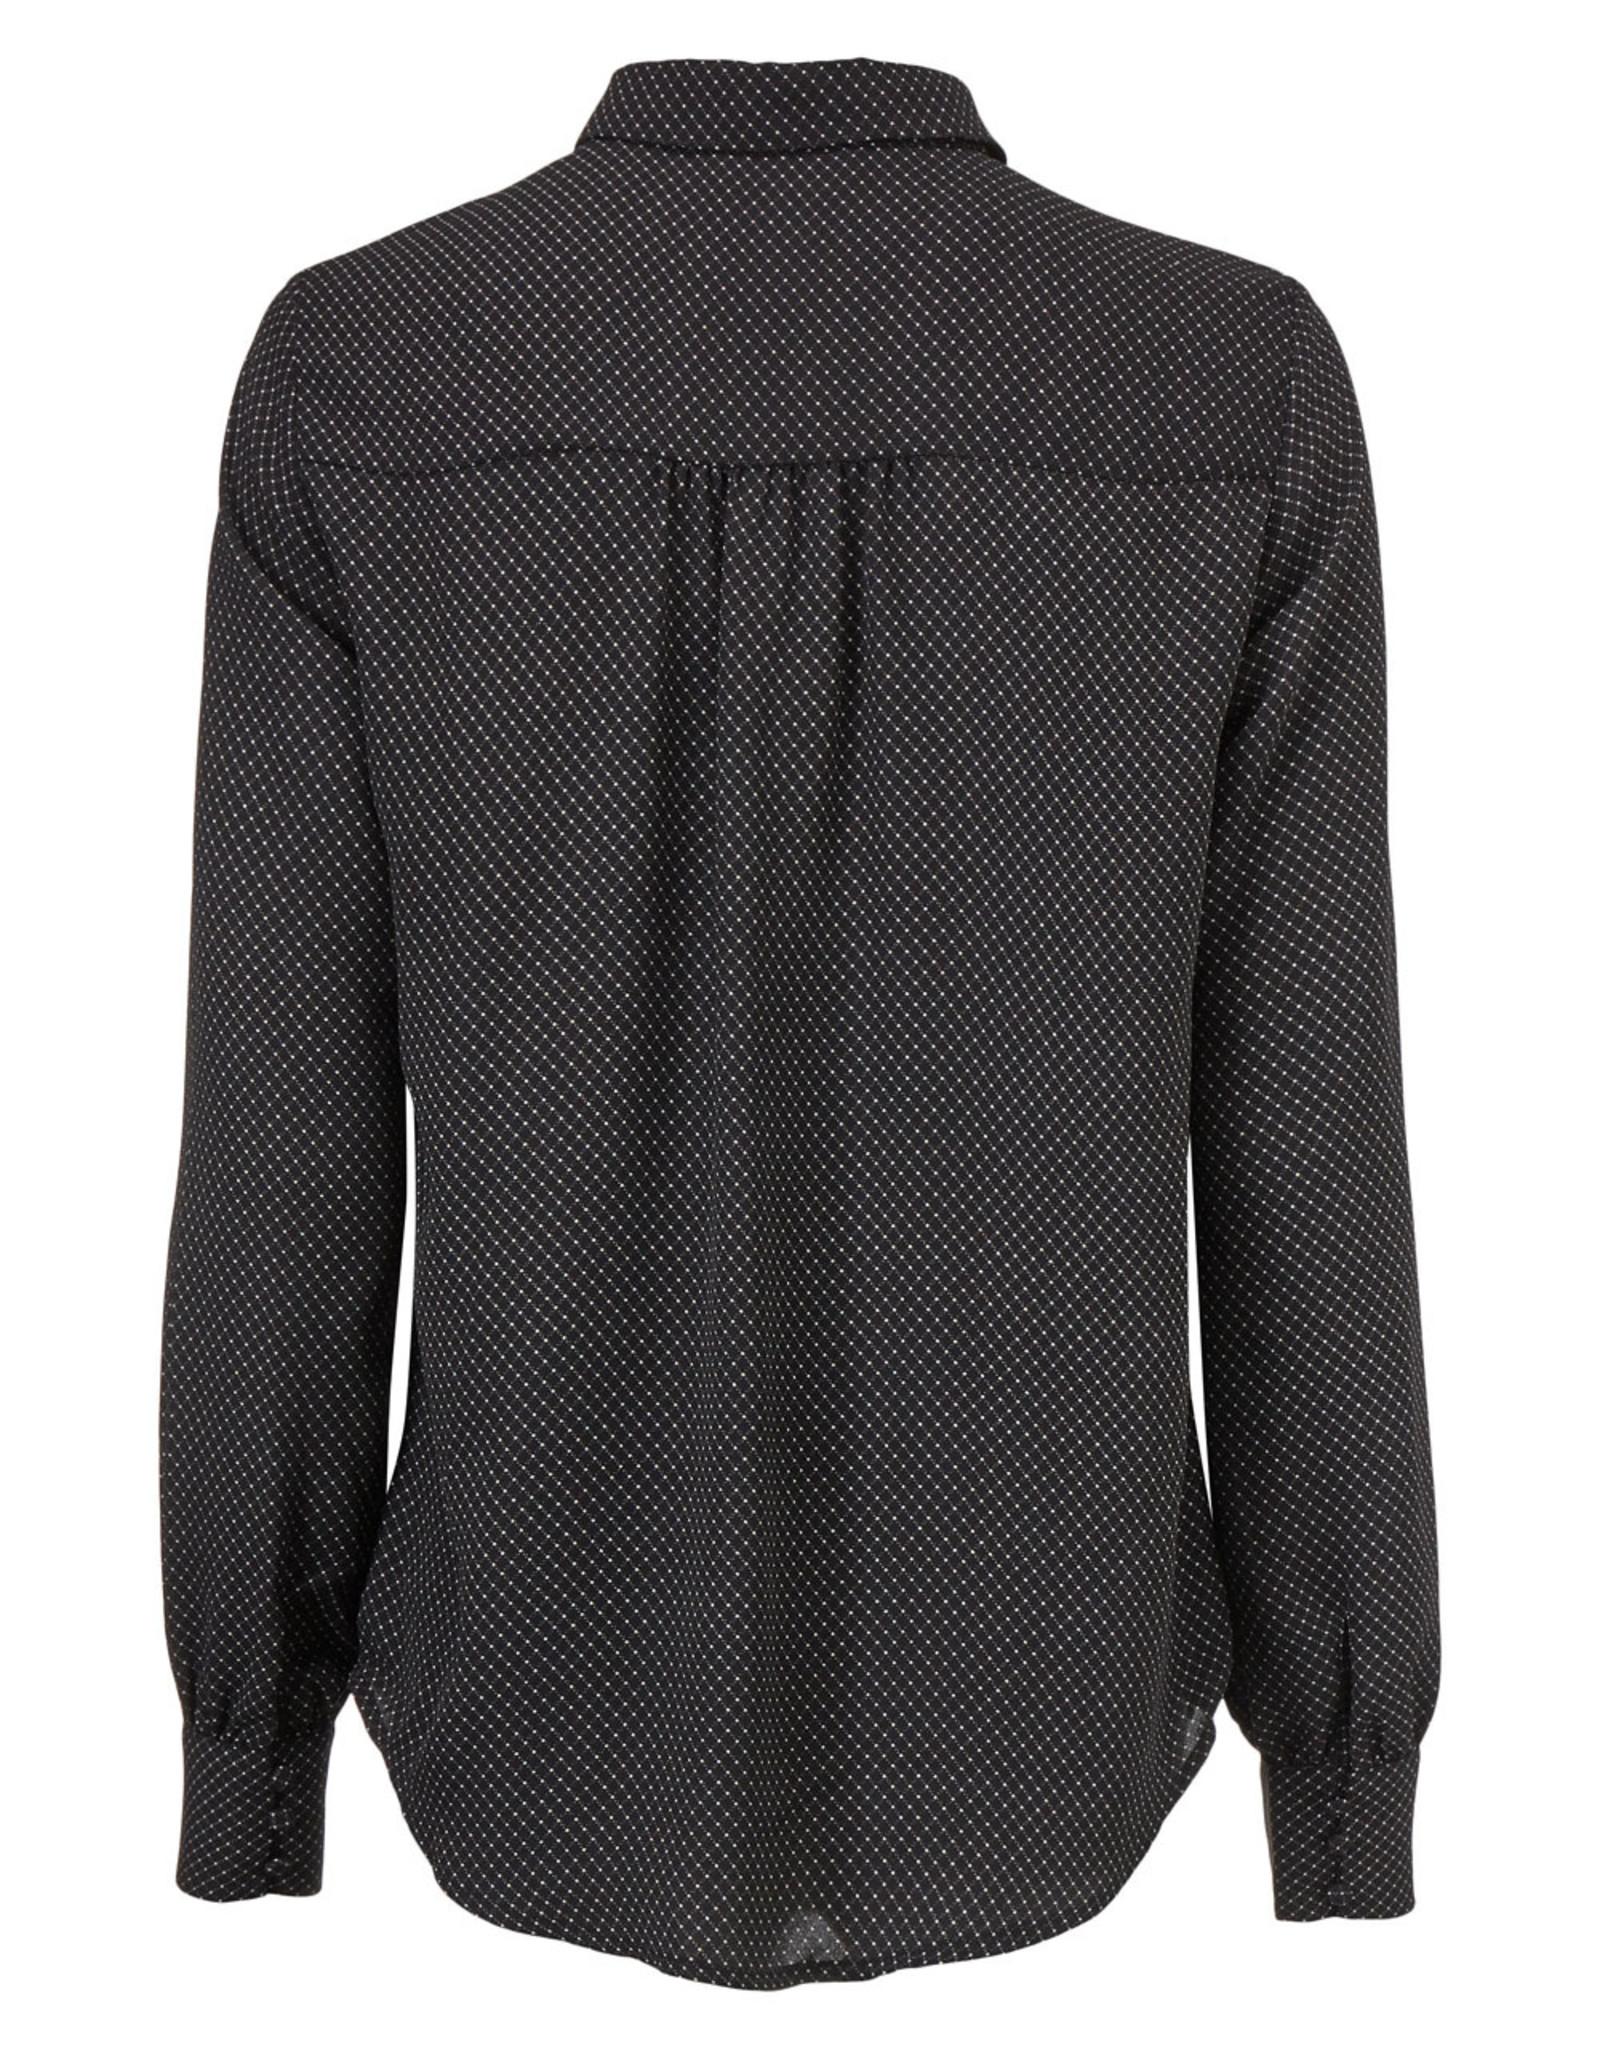 Modstrom Edna Print Shirt Dark Grid